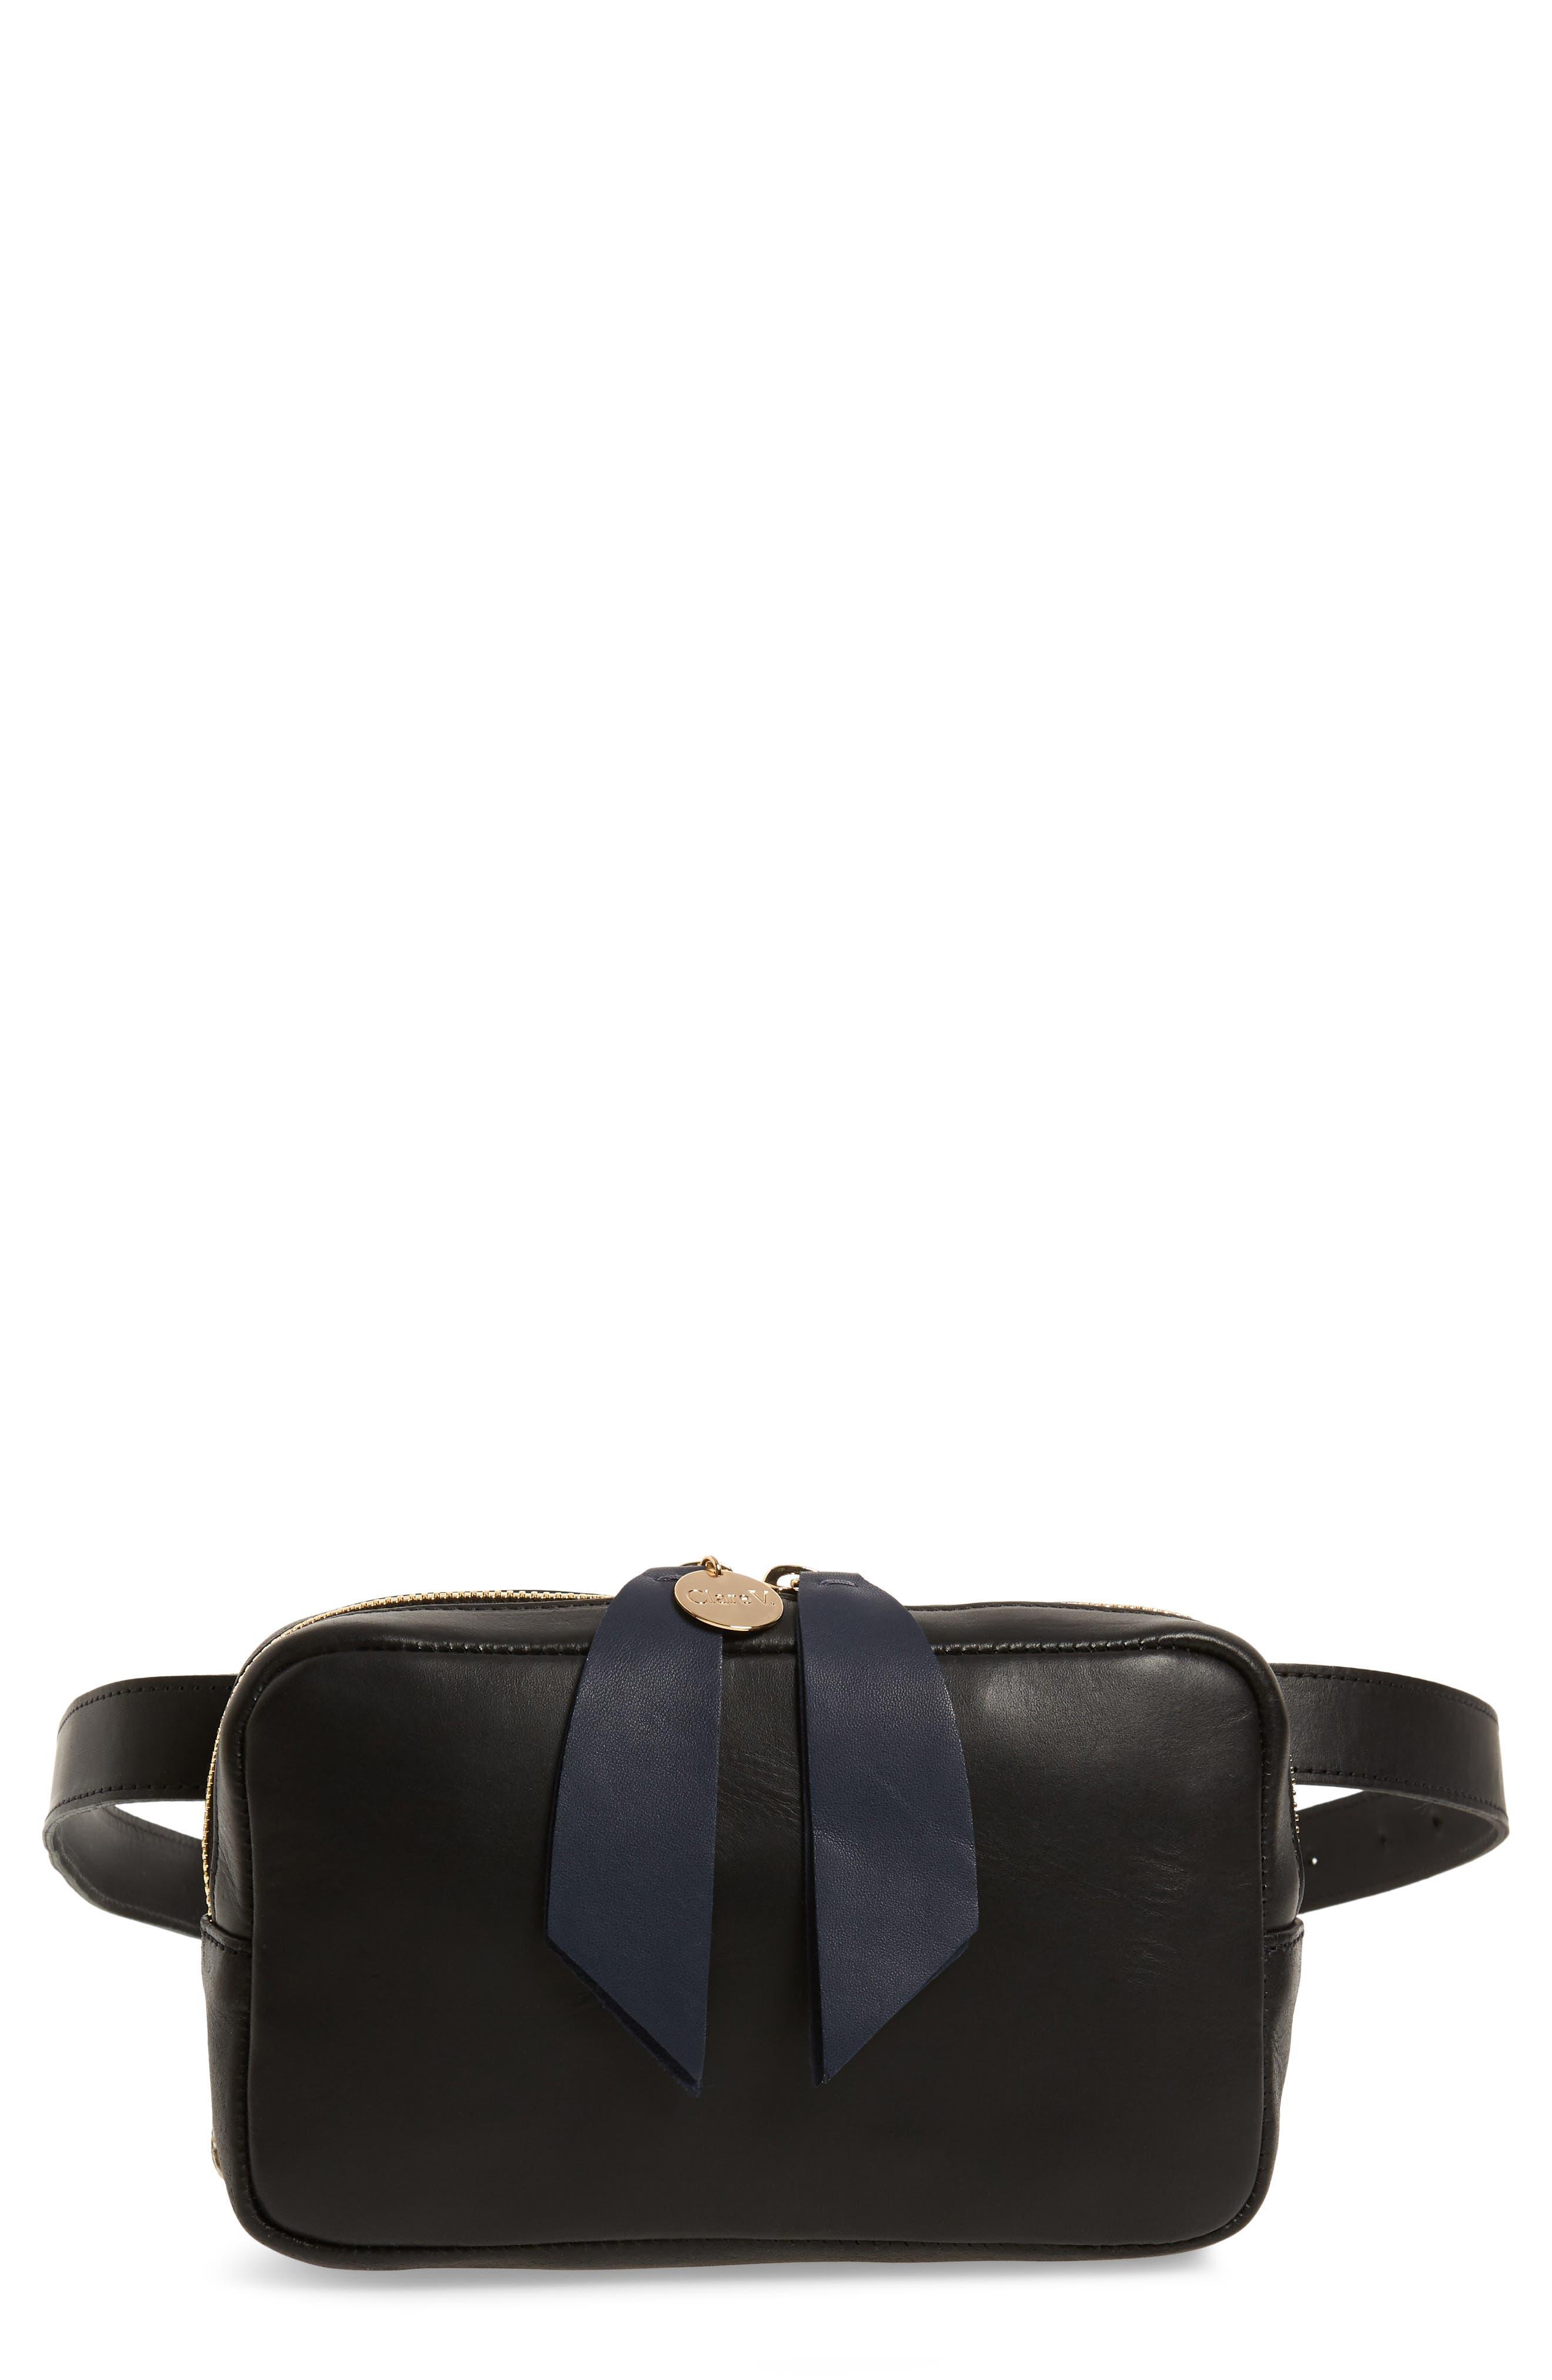 CLARE V. Le Belt Leather Convertible Crossbody Bag, Main, color, BLACK VEGAN